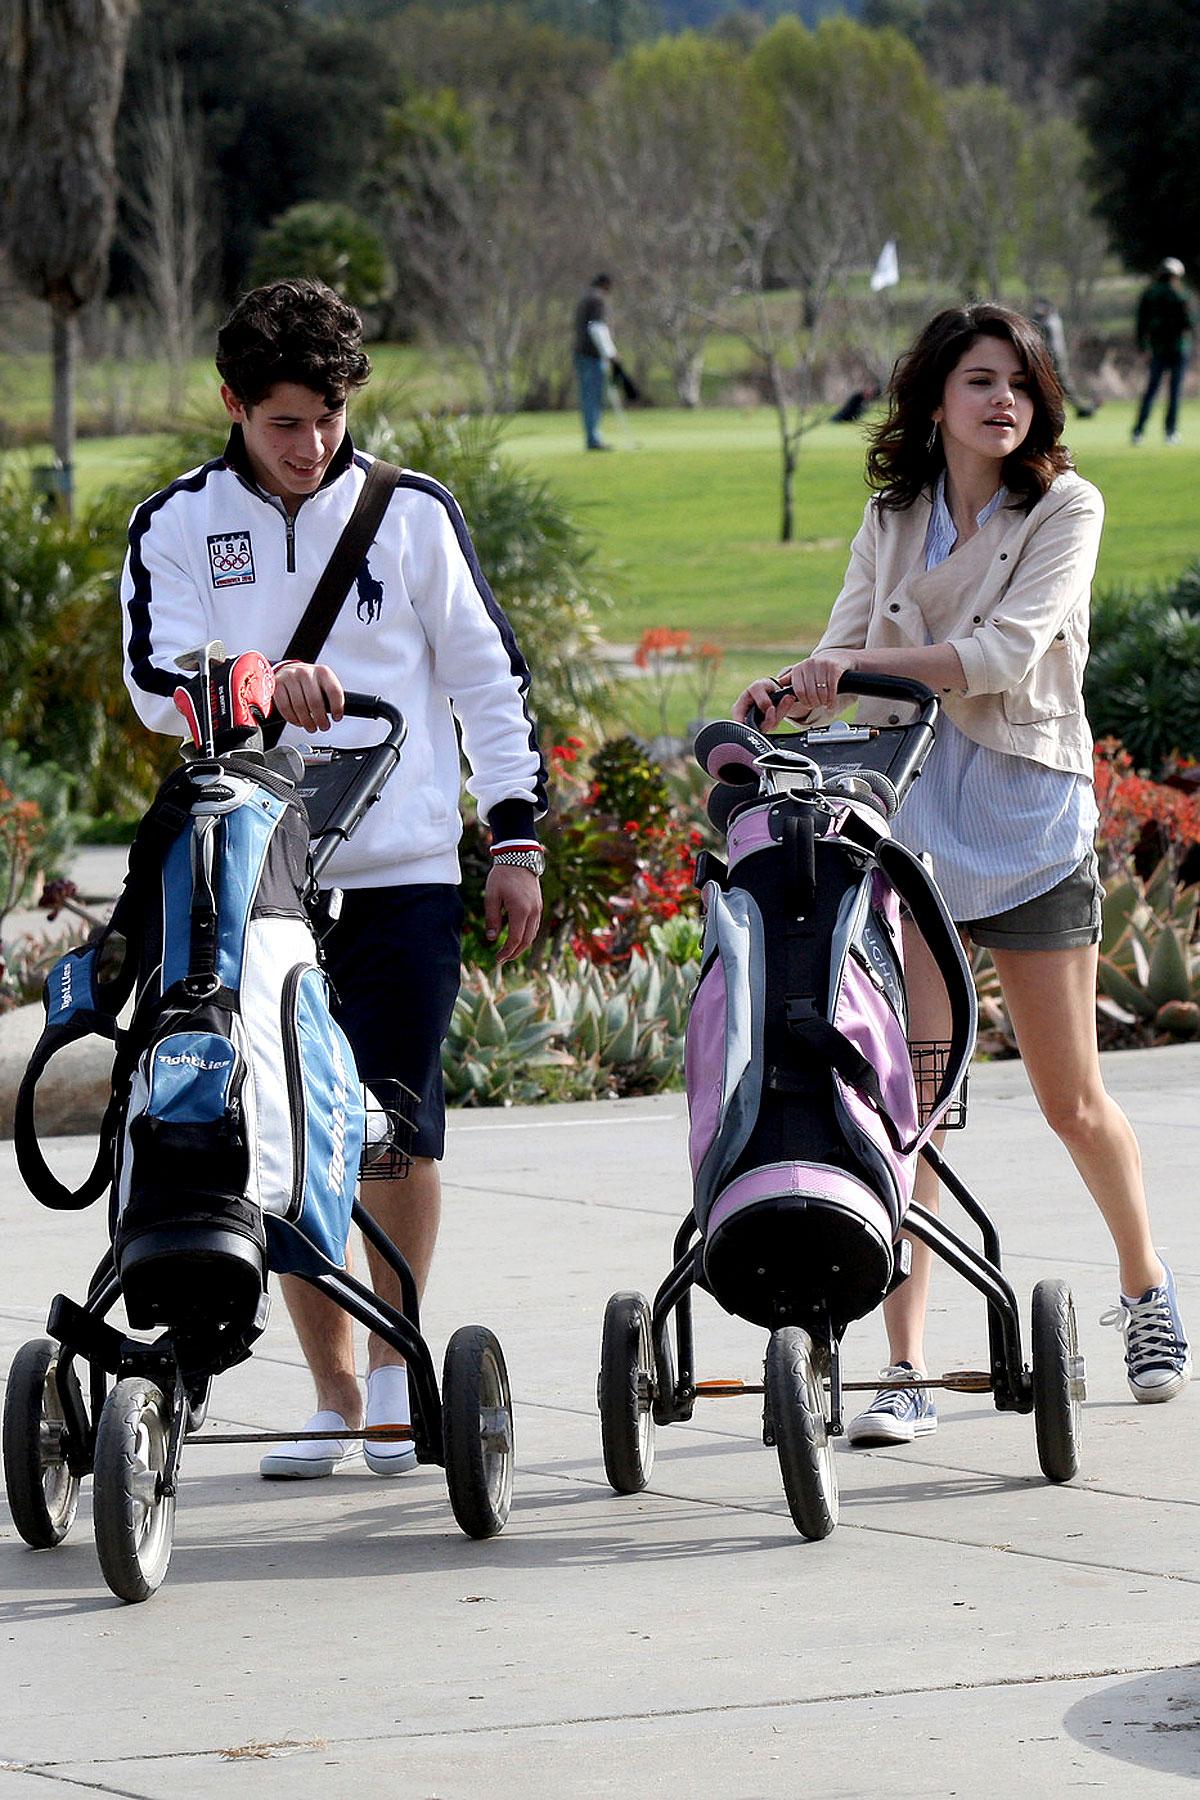 Nick Jonas and Selena Gomez Go For Some Couples Golfing (PHOTOS)